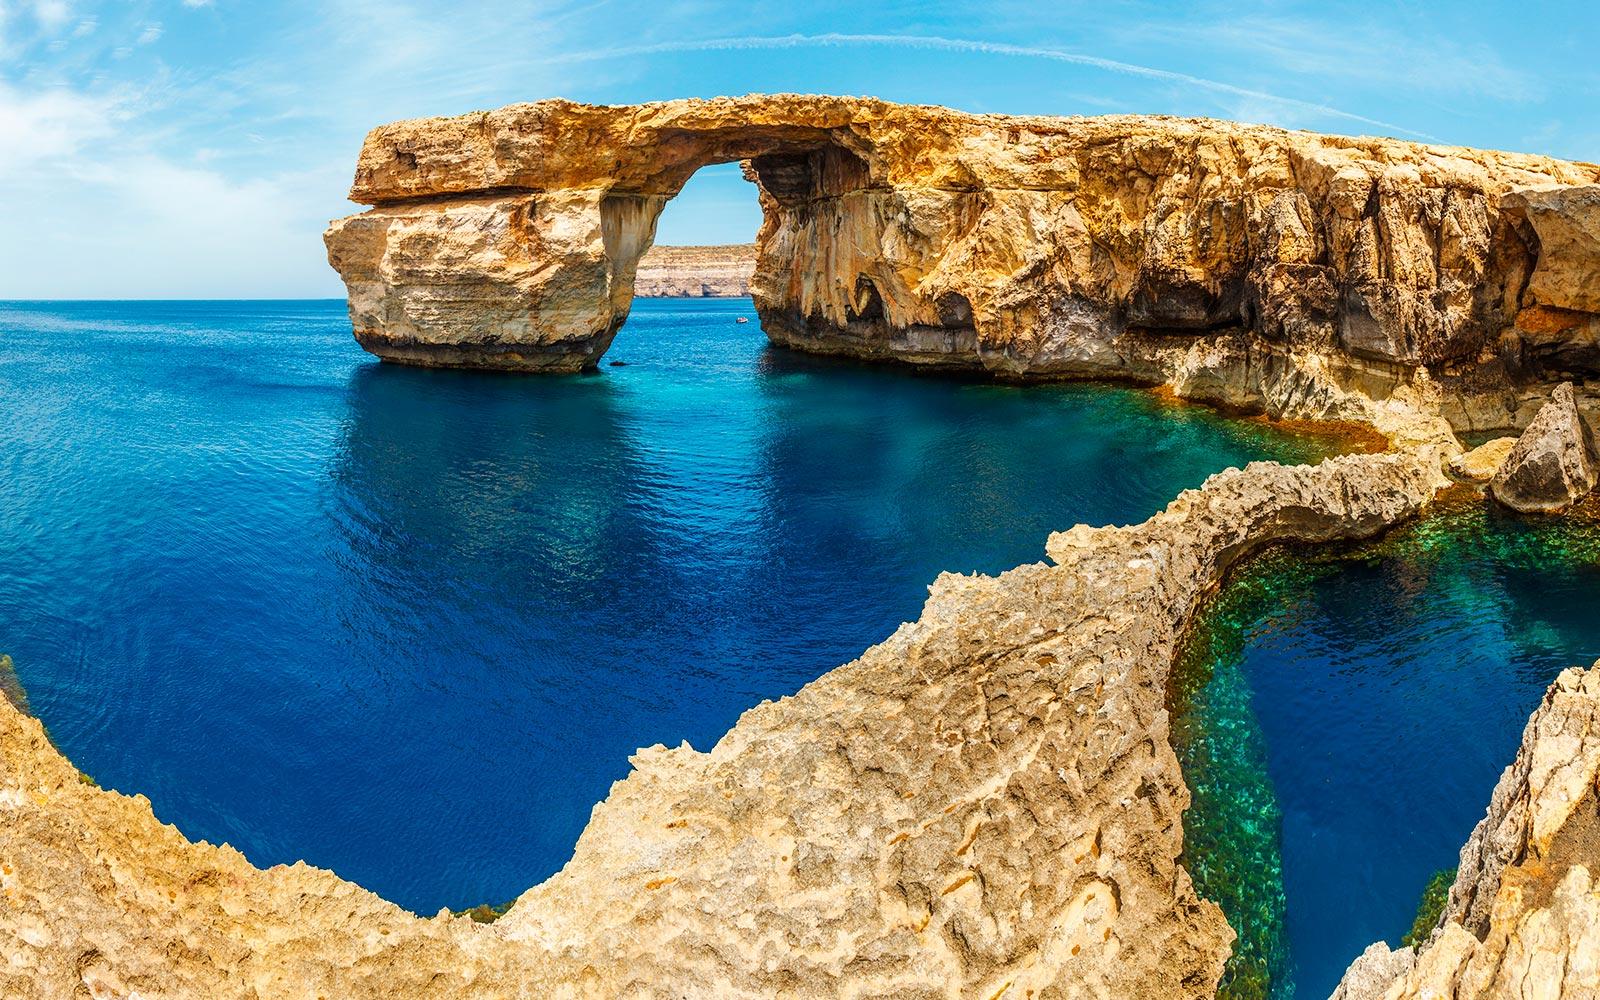 malta-gozo-and-comino-a-paradise-in-the-secret-world